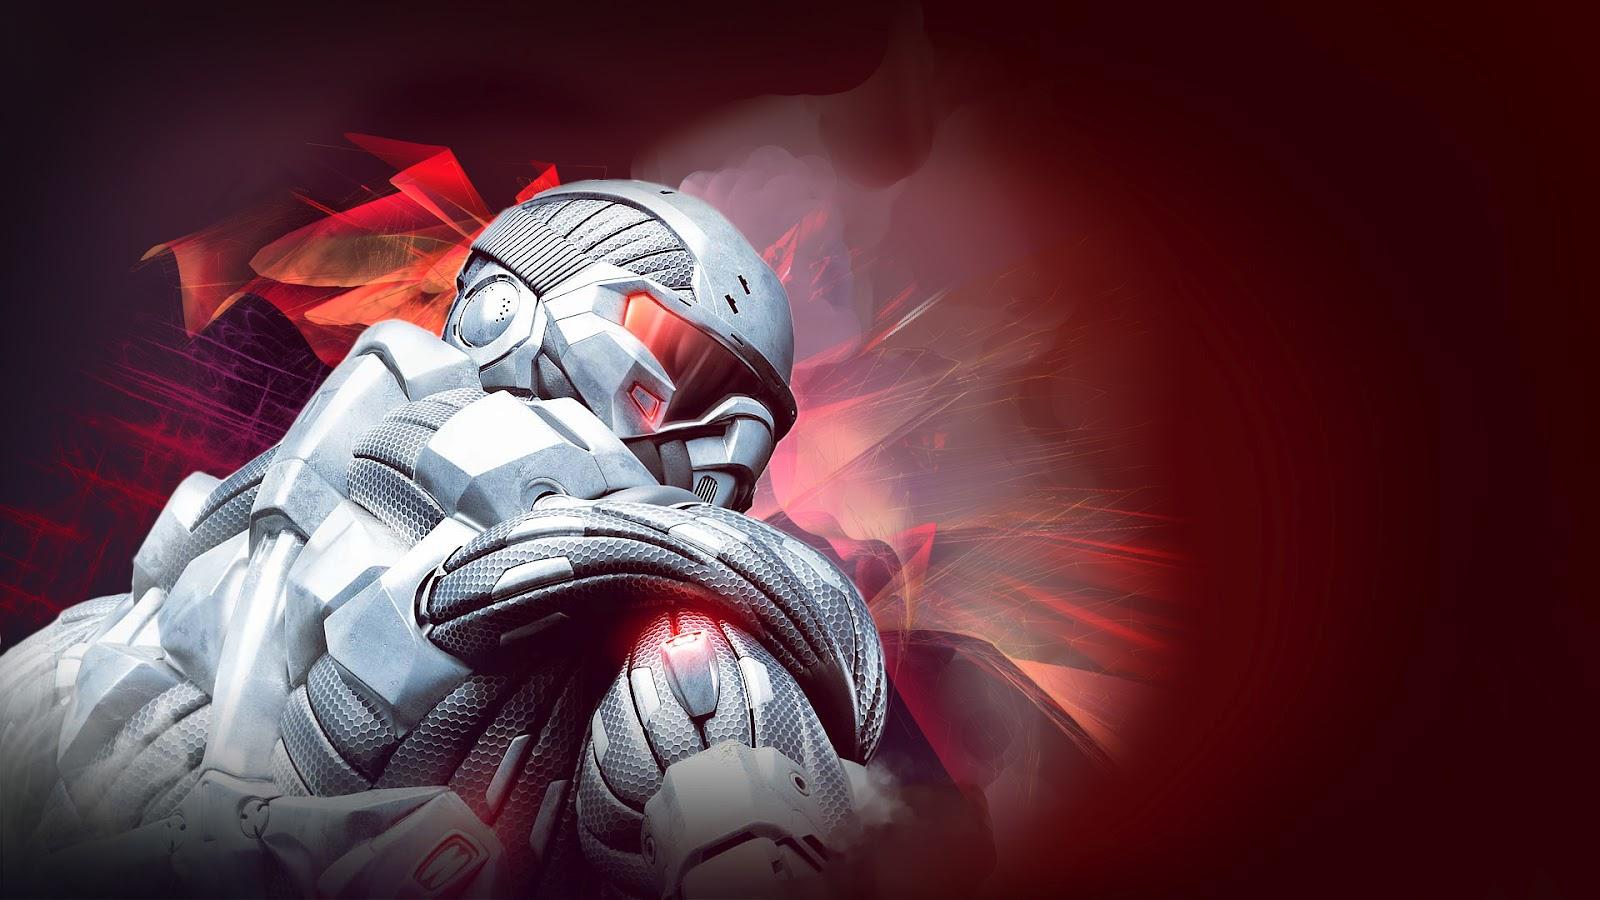 trololo blogg Crysis 2 Hd Wallpaper 1080p